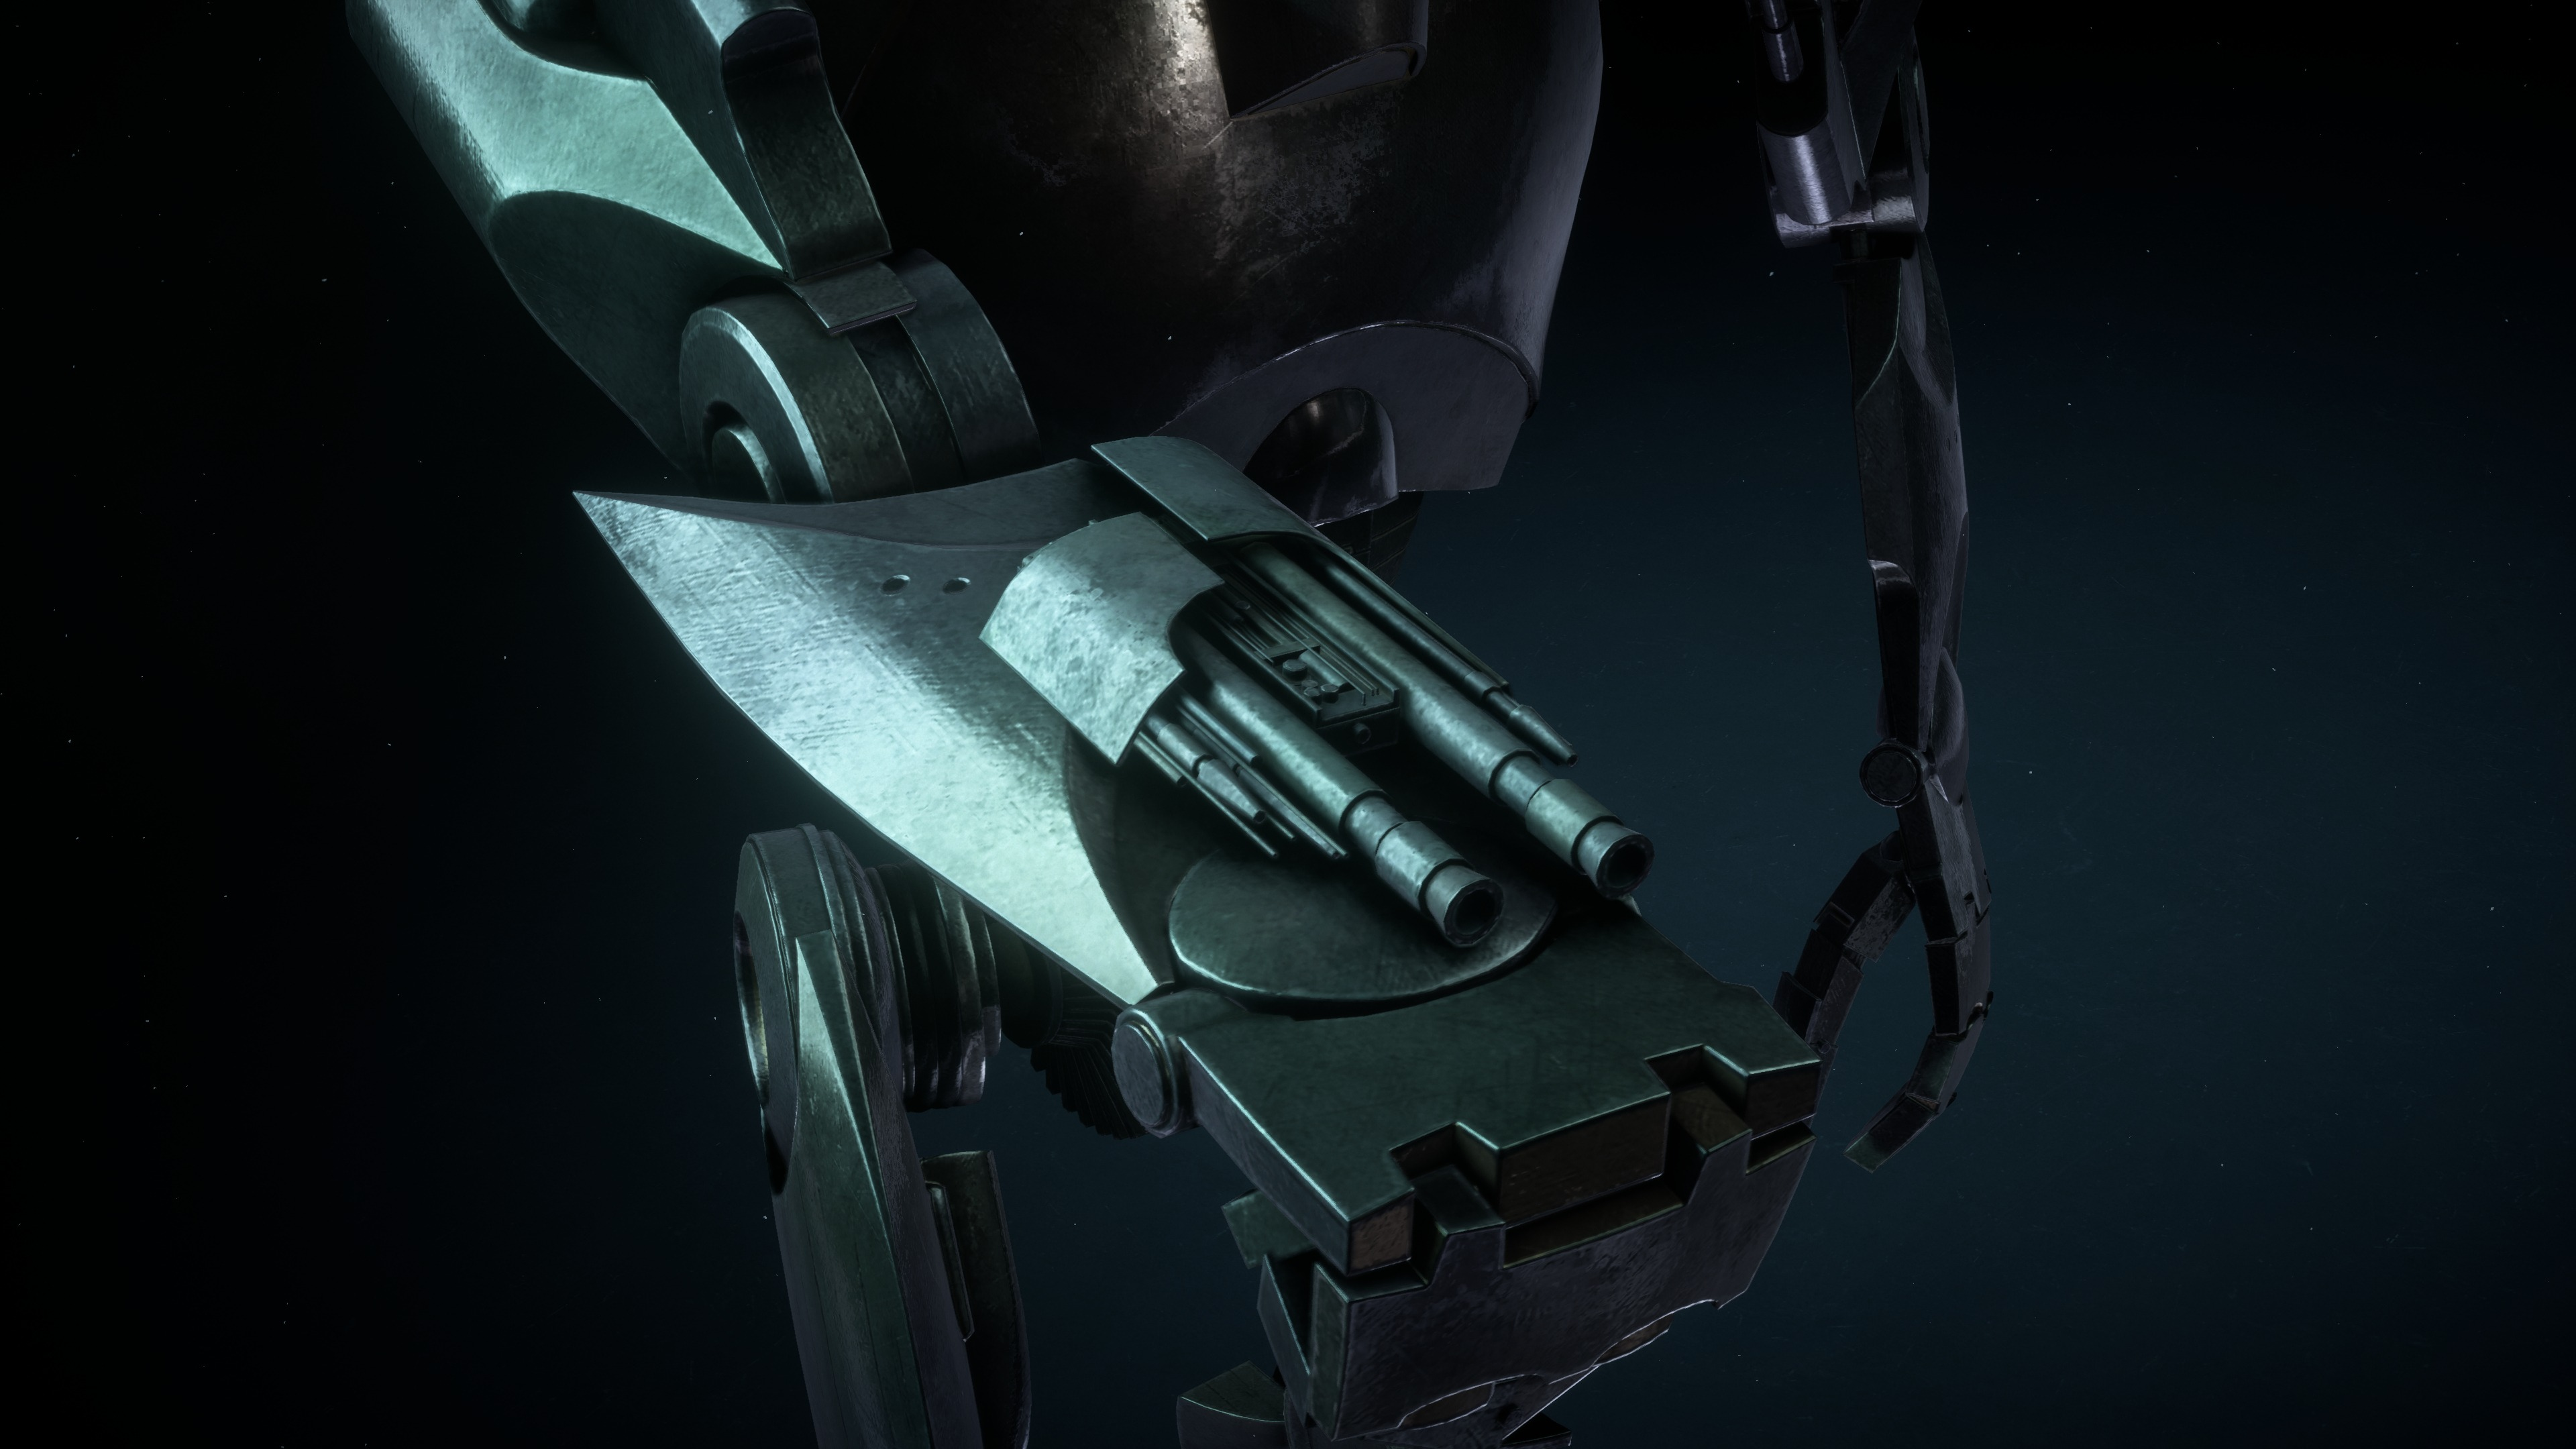 Wrist Blaster